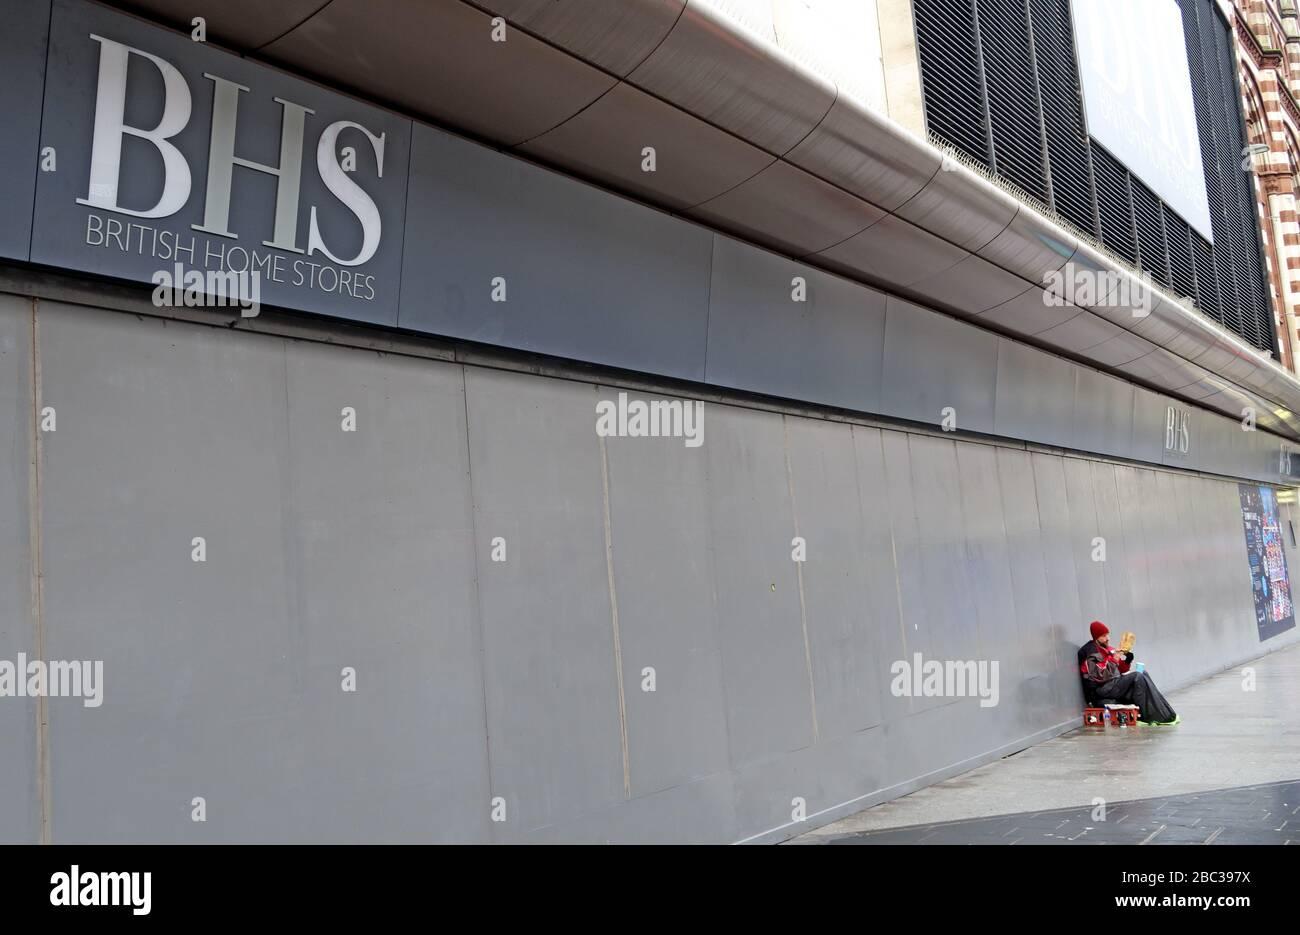 HotpixUK,@HotpixUK,GoTonySmith,67-81 Sauchiehall Street,Scotland,UK,retail,bankrupt,high street,person,shopping,fail,failure